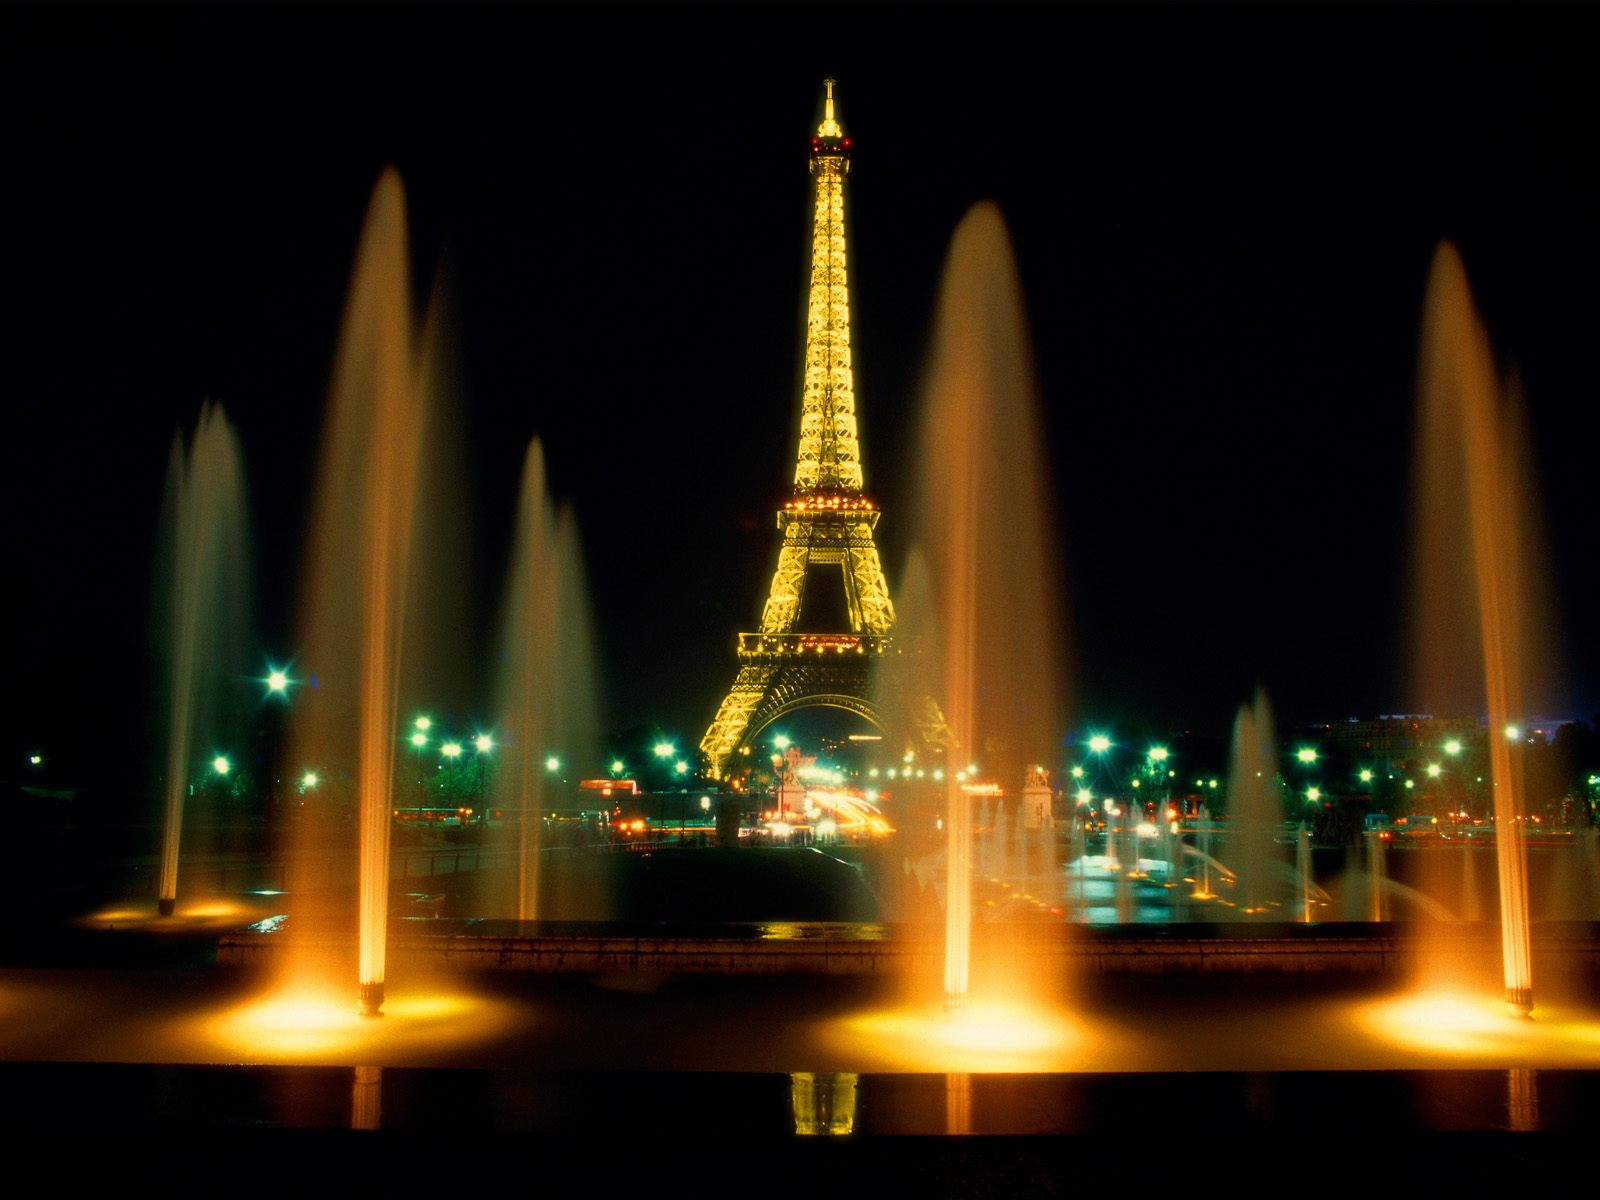 eiffel tower at night paris francejpg 1600x1200